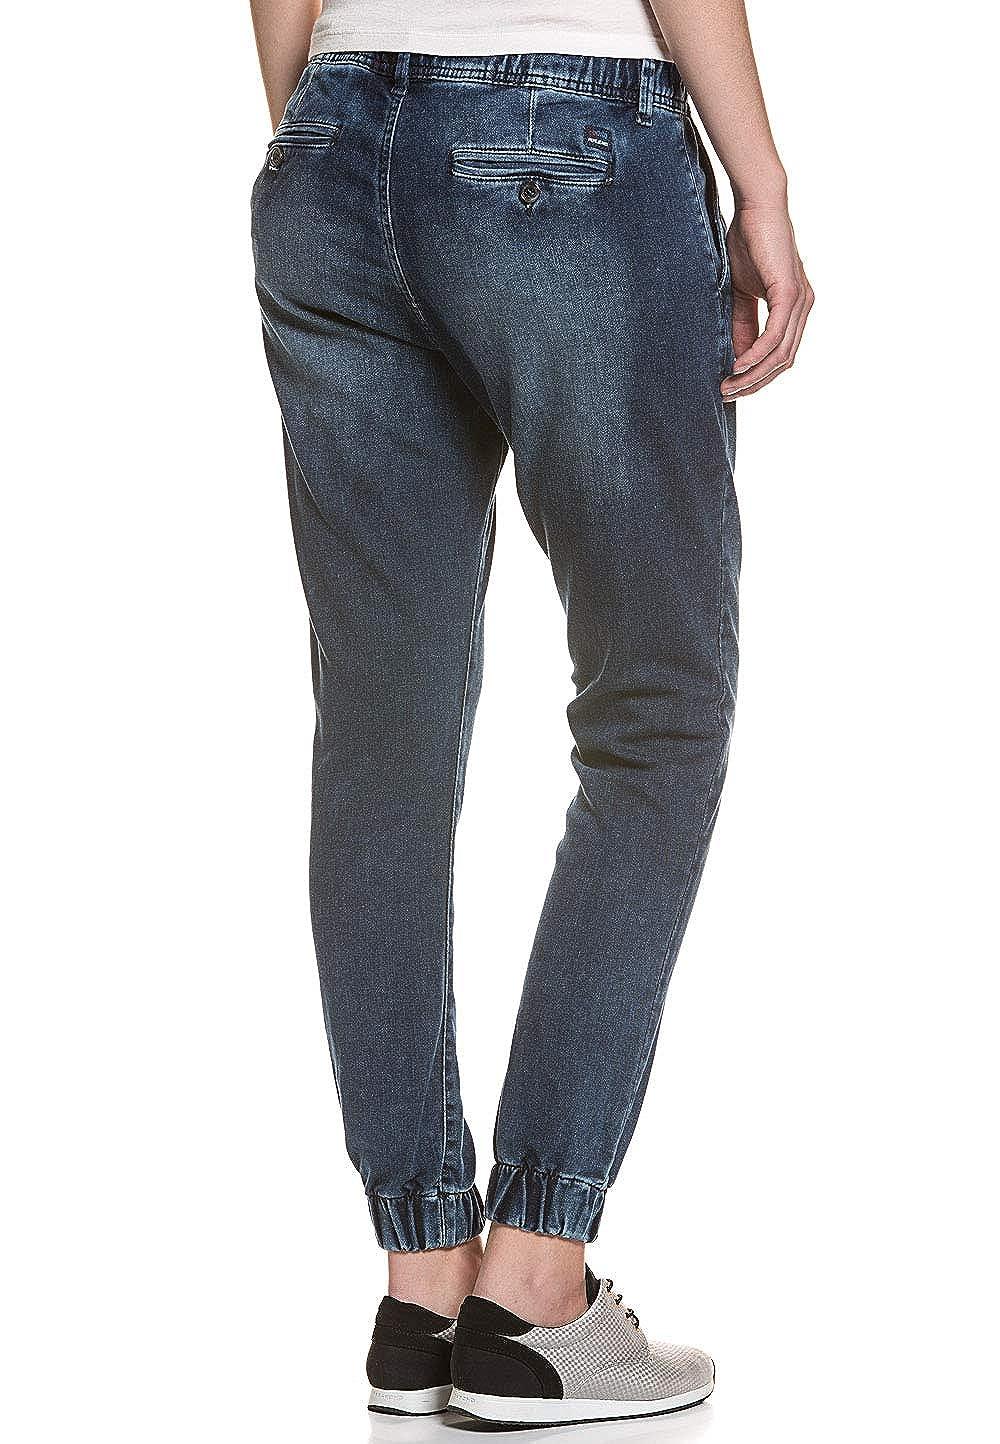 Pepe Jeans COSIE Jeans Gymdigo DK Used: : Bekleidung